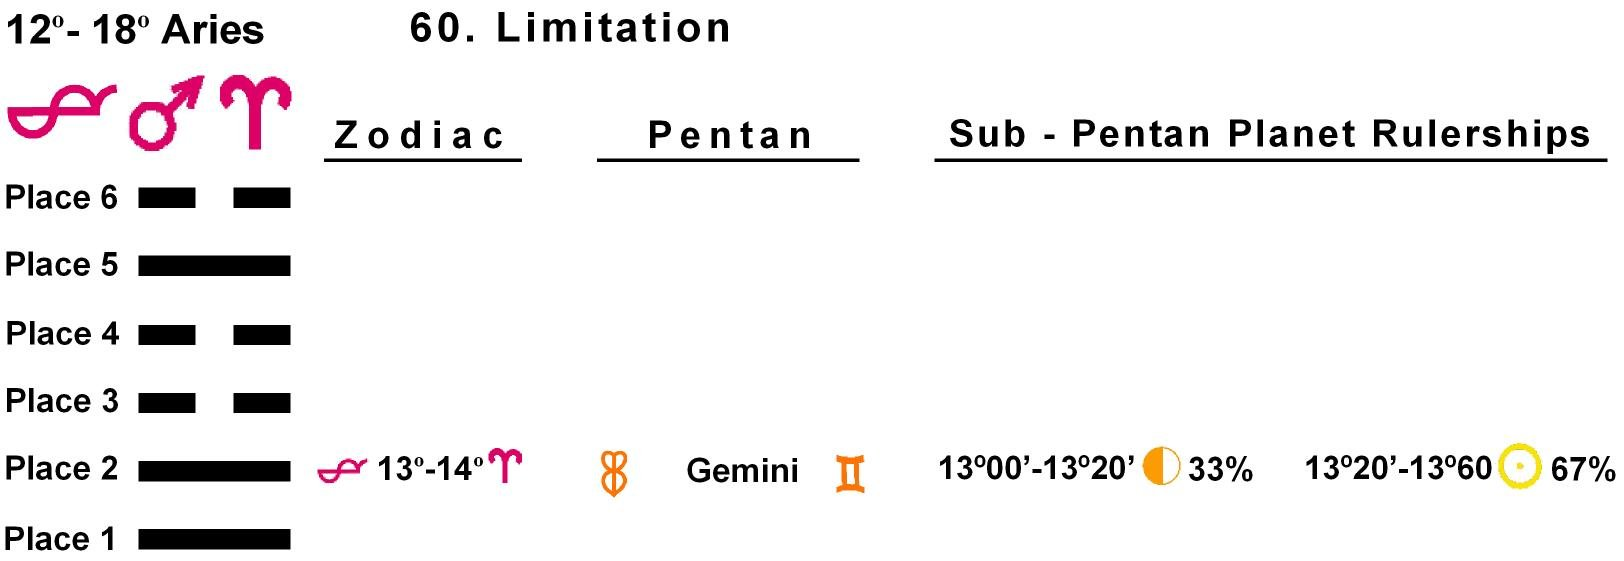 Pent-lines-01AR 13-14 Hx-60 Limitation